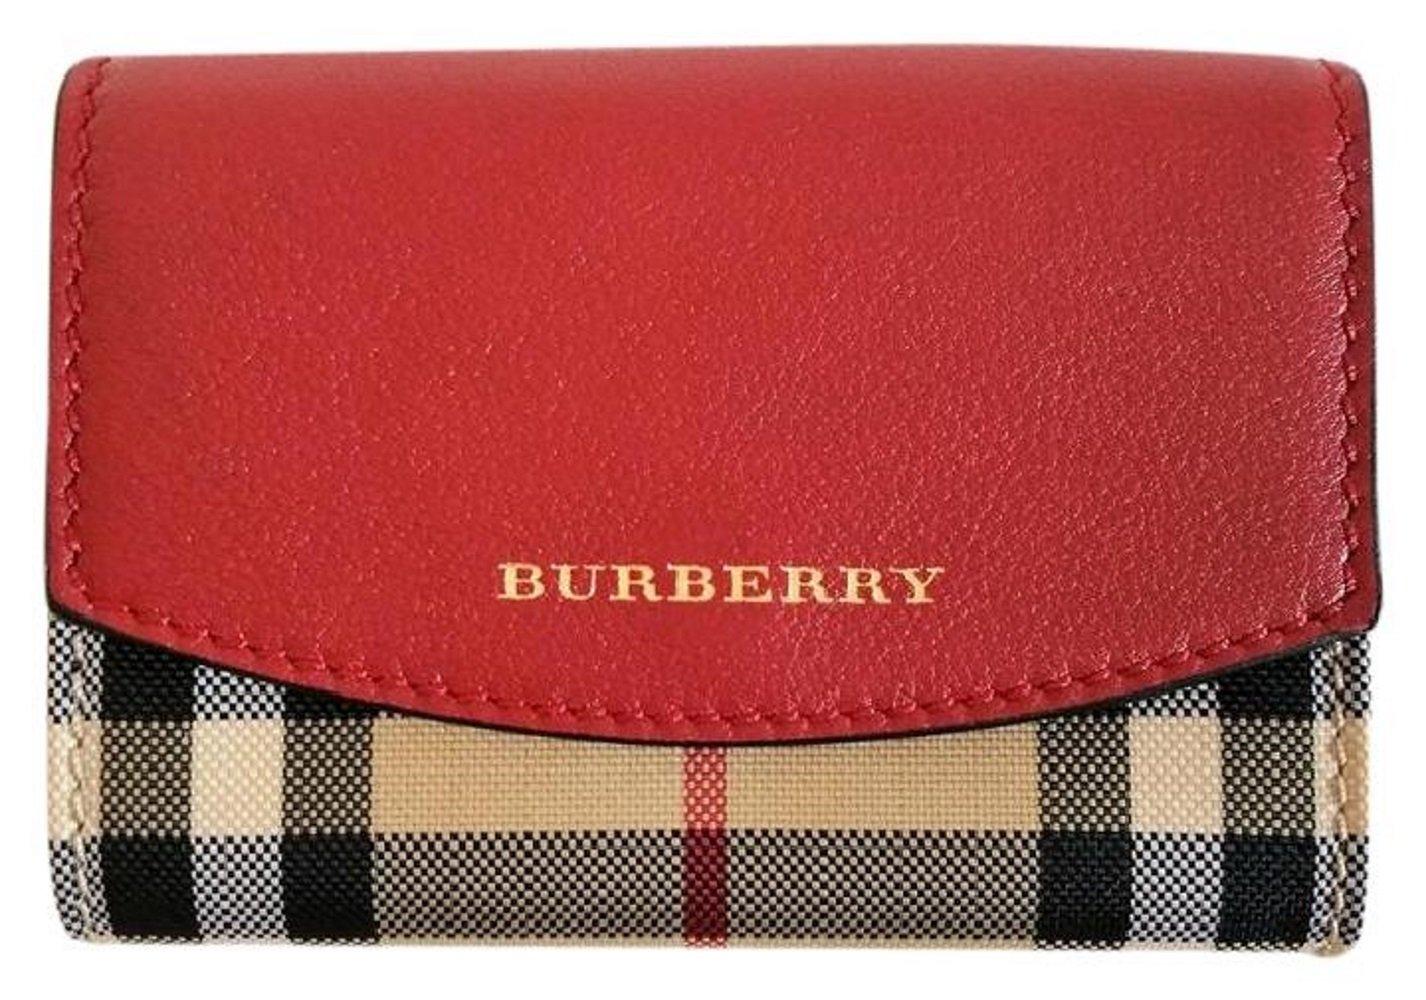 Burberry Horseferry Check Chesham Card Case